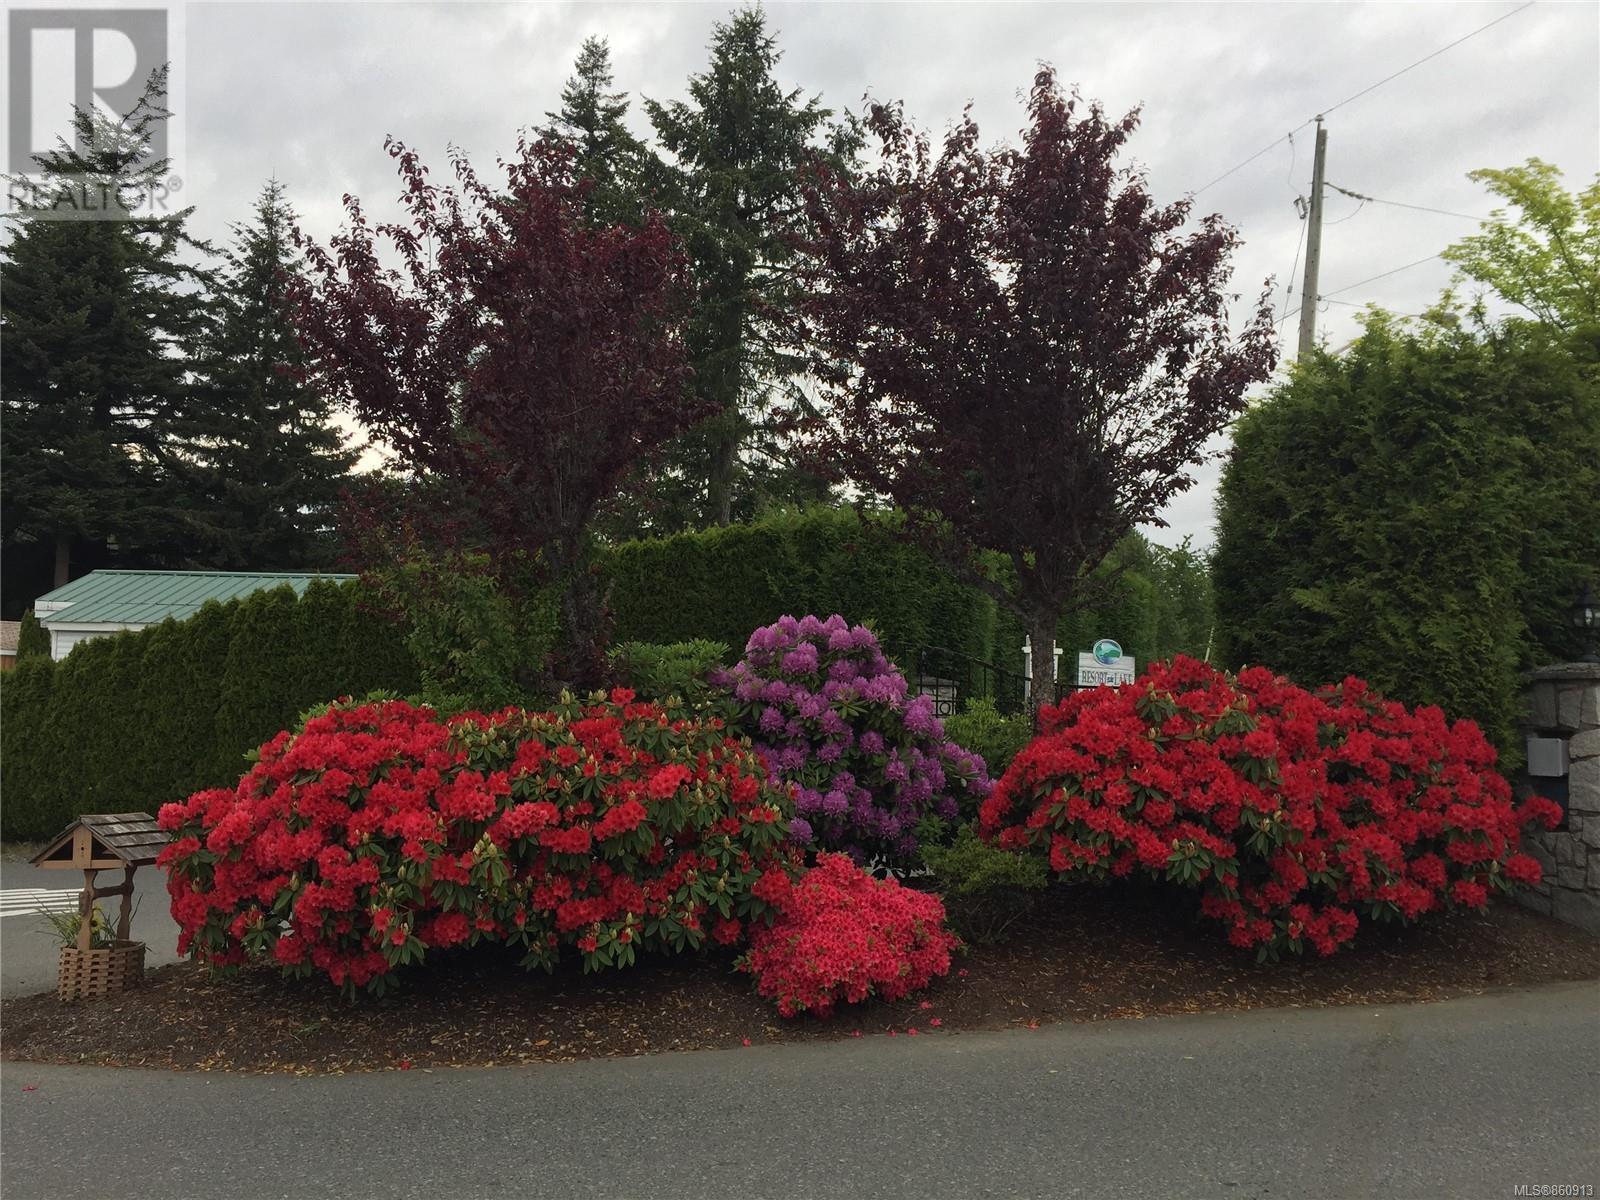 47 2134 Henderson Lake Way, Nanaimo, British Columbia  V9R 6X7 - Photo 22 - 860913